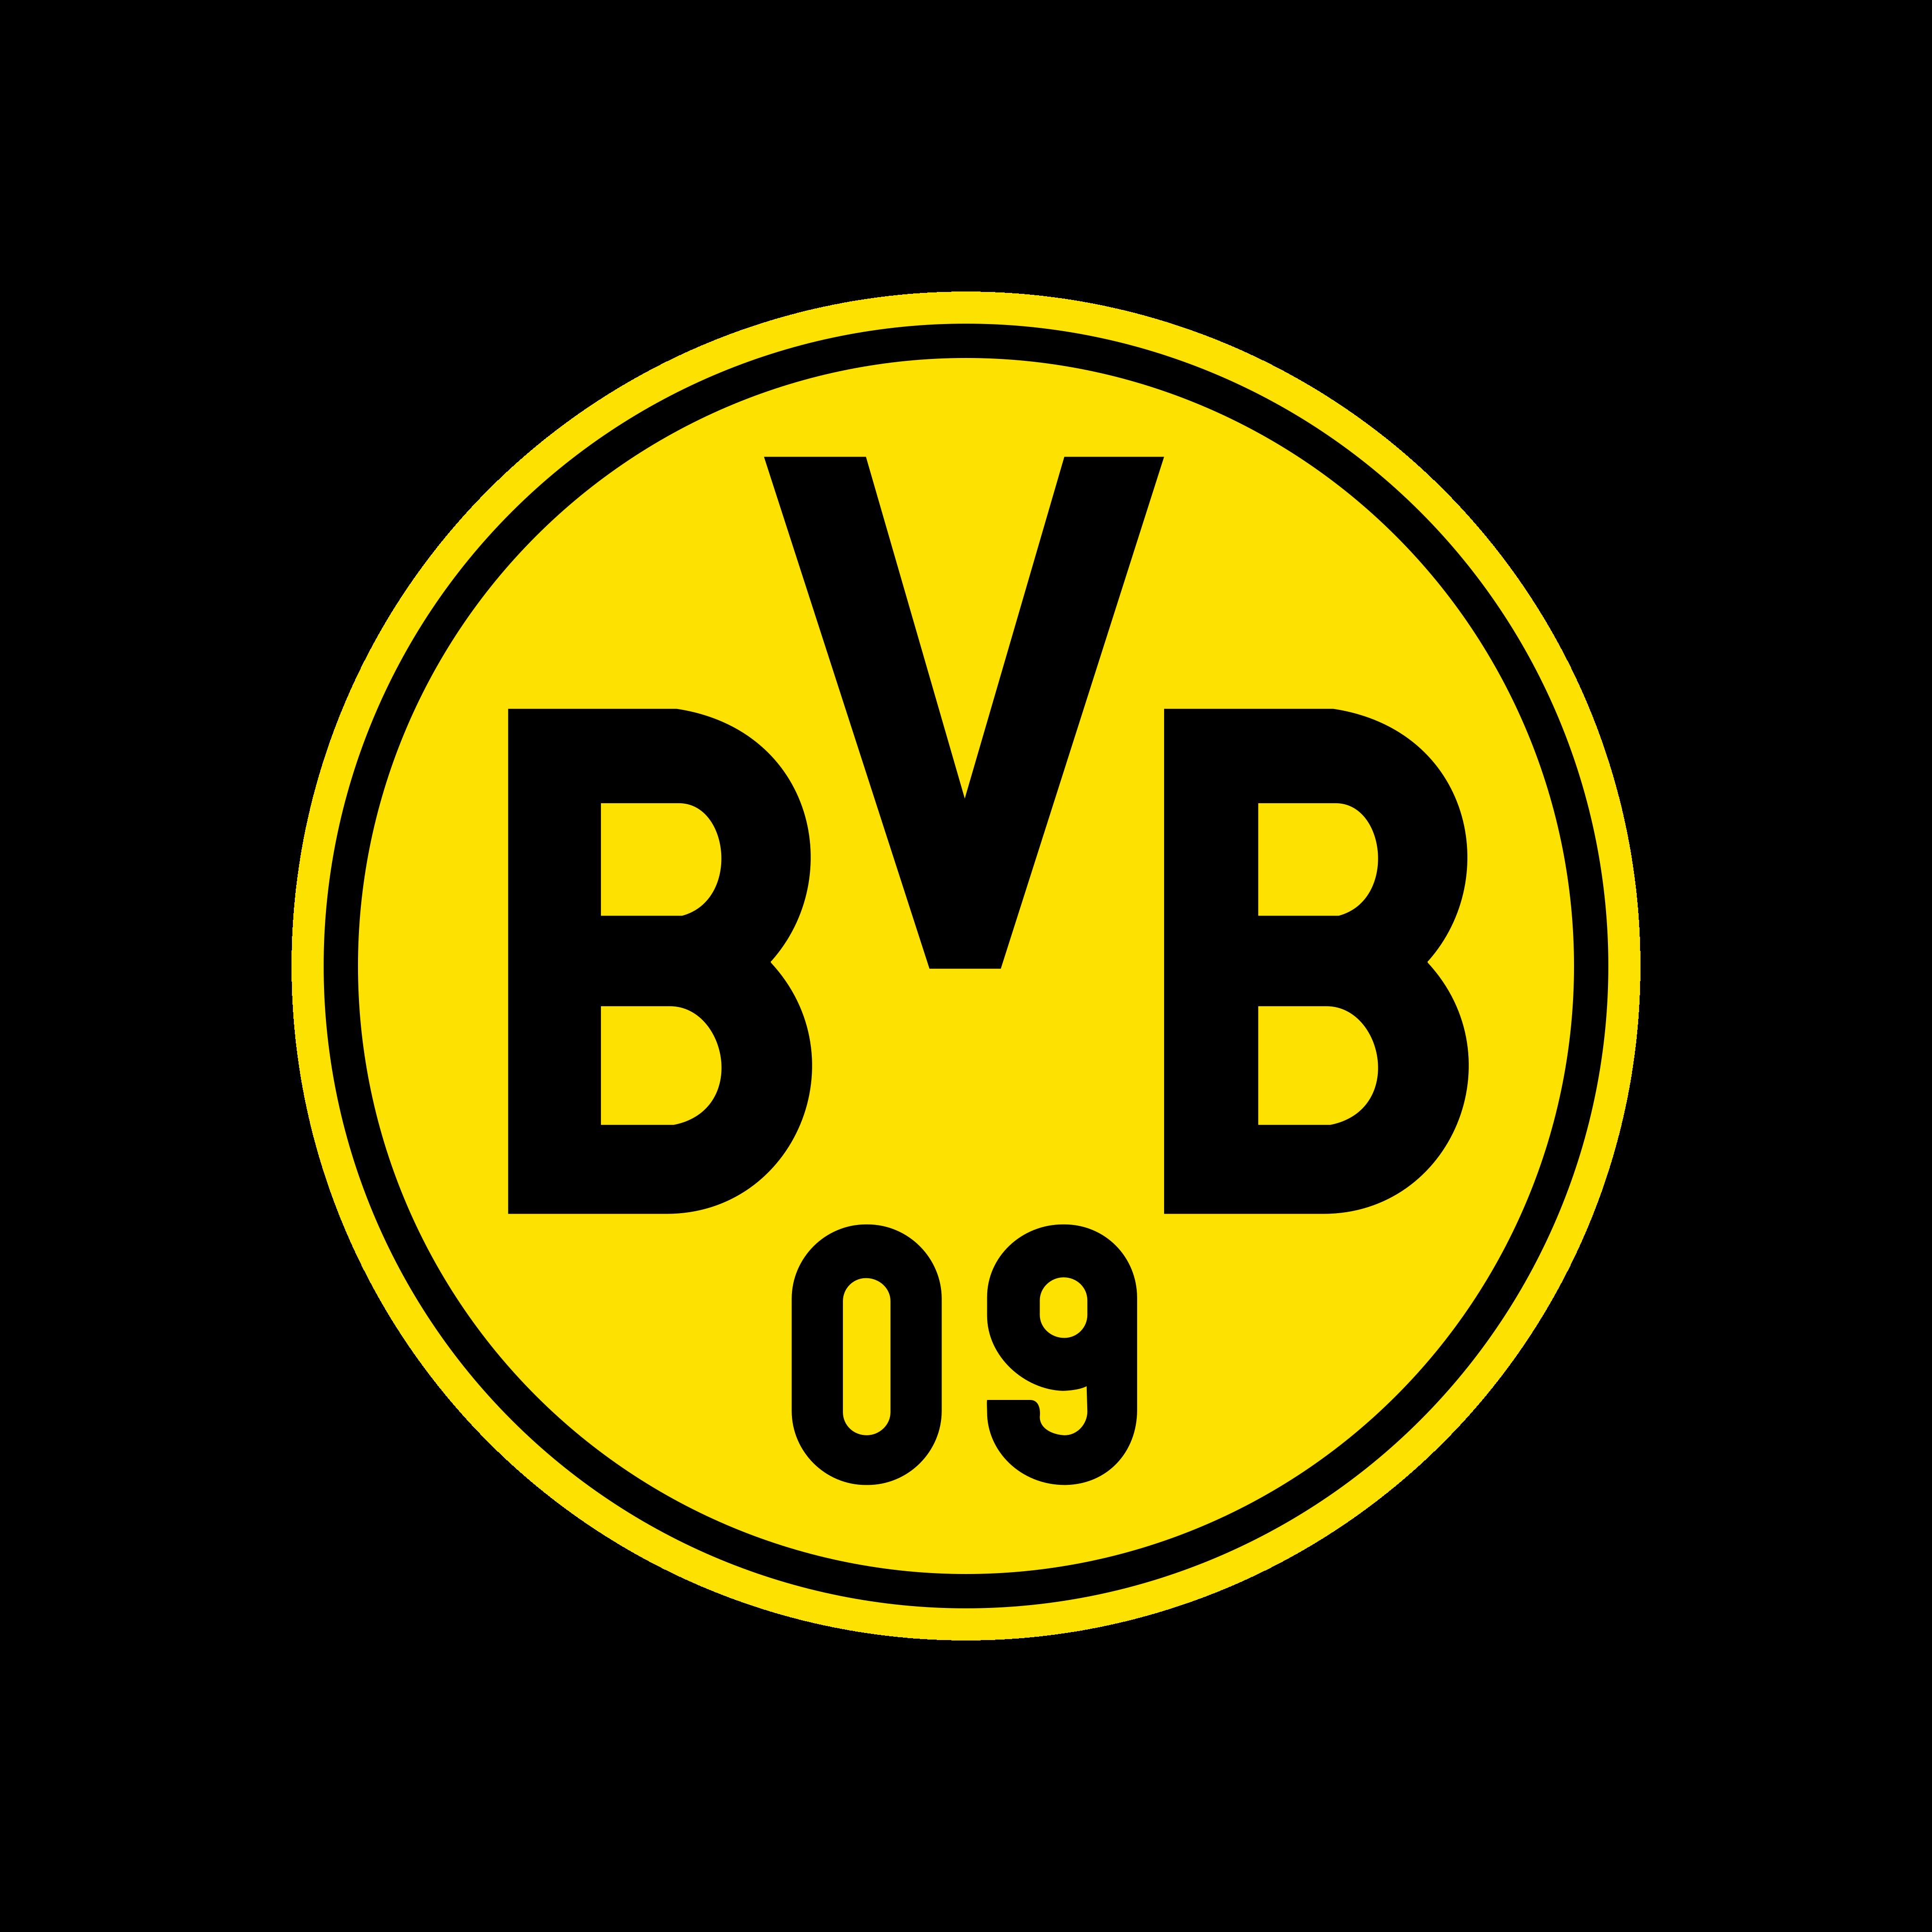 bvb borussia dortmund logo 0 - Borussia Dortmund Logo